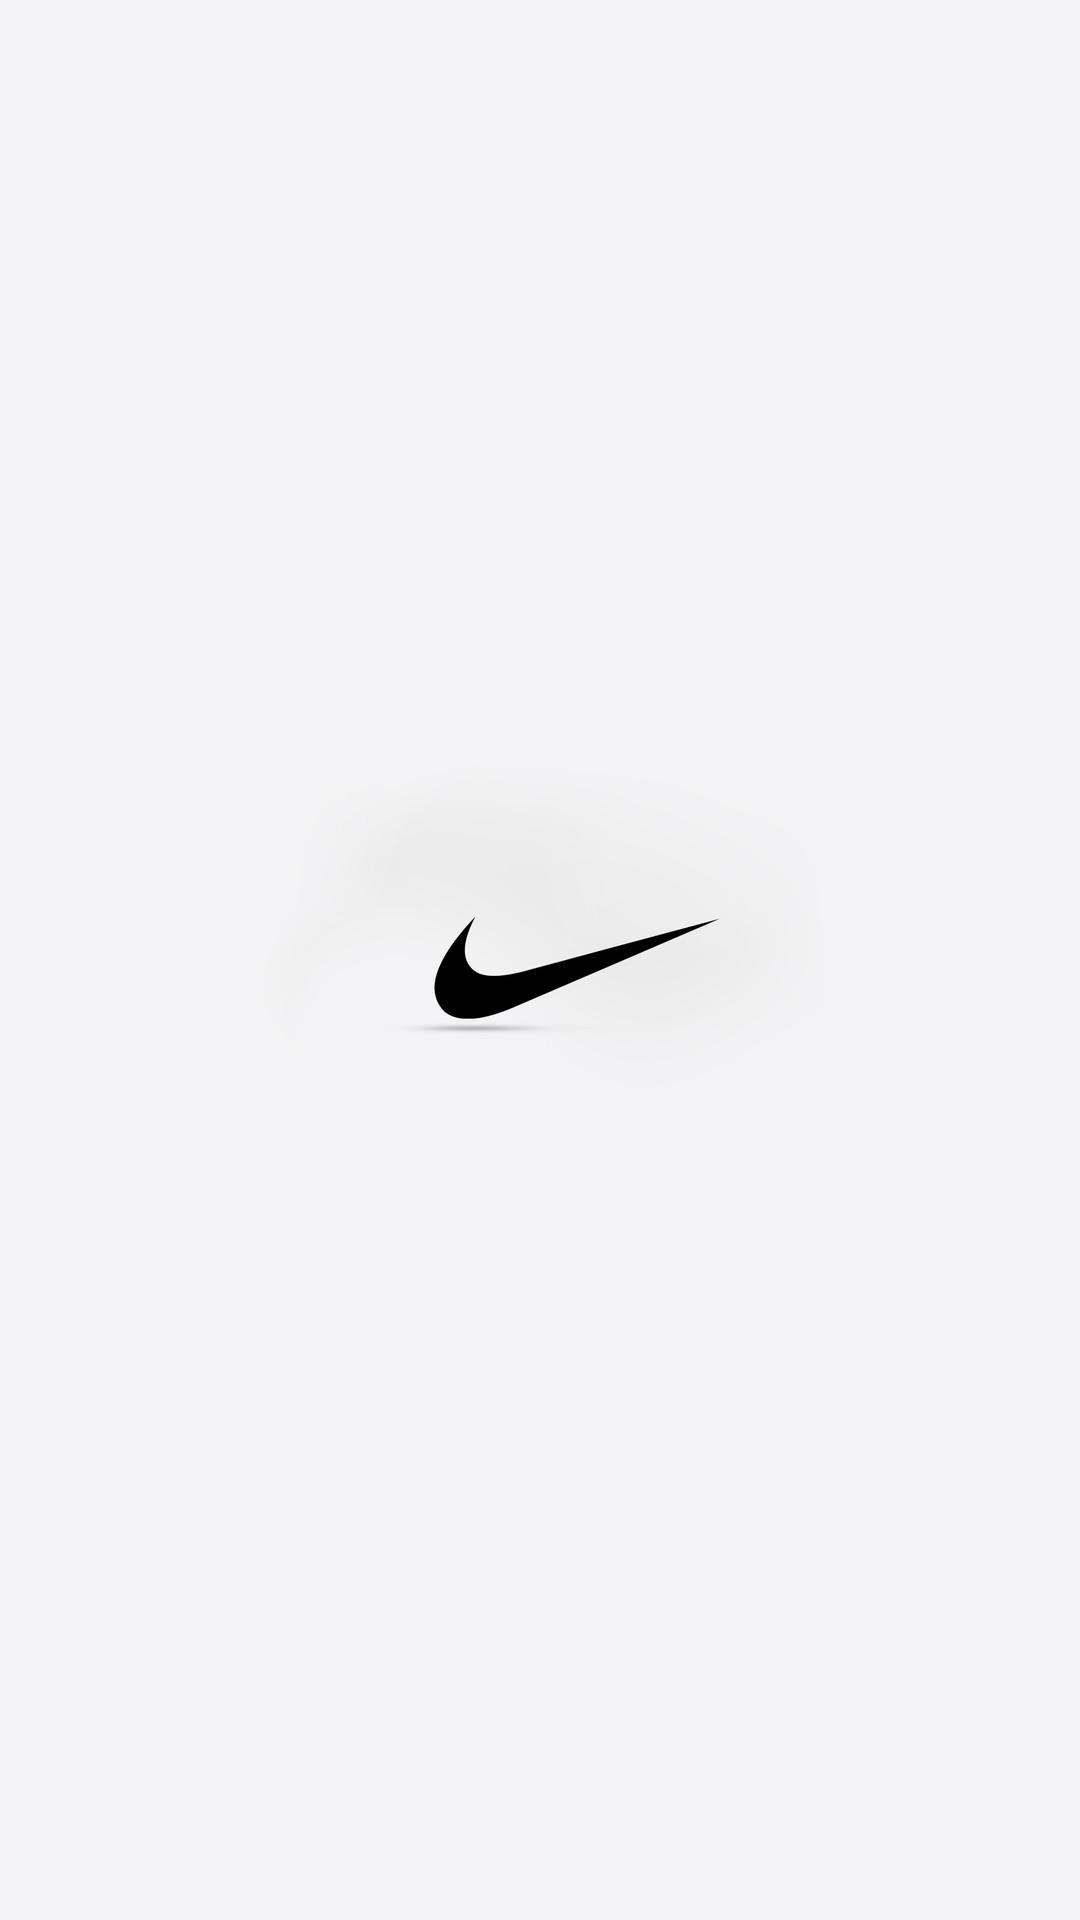 White Nike Wallpaper 65 Images